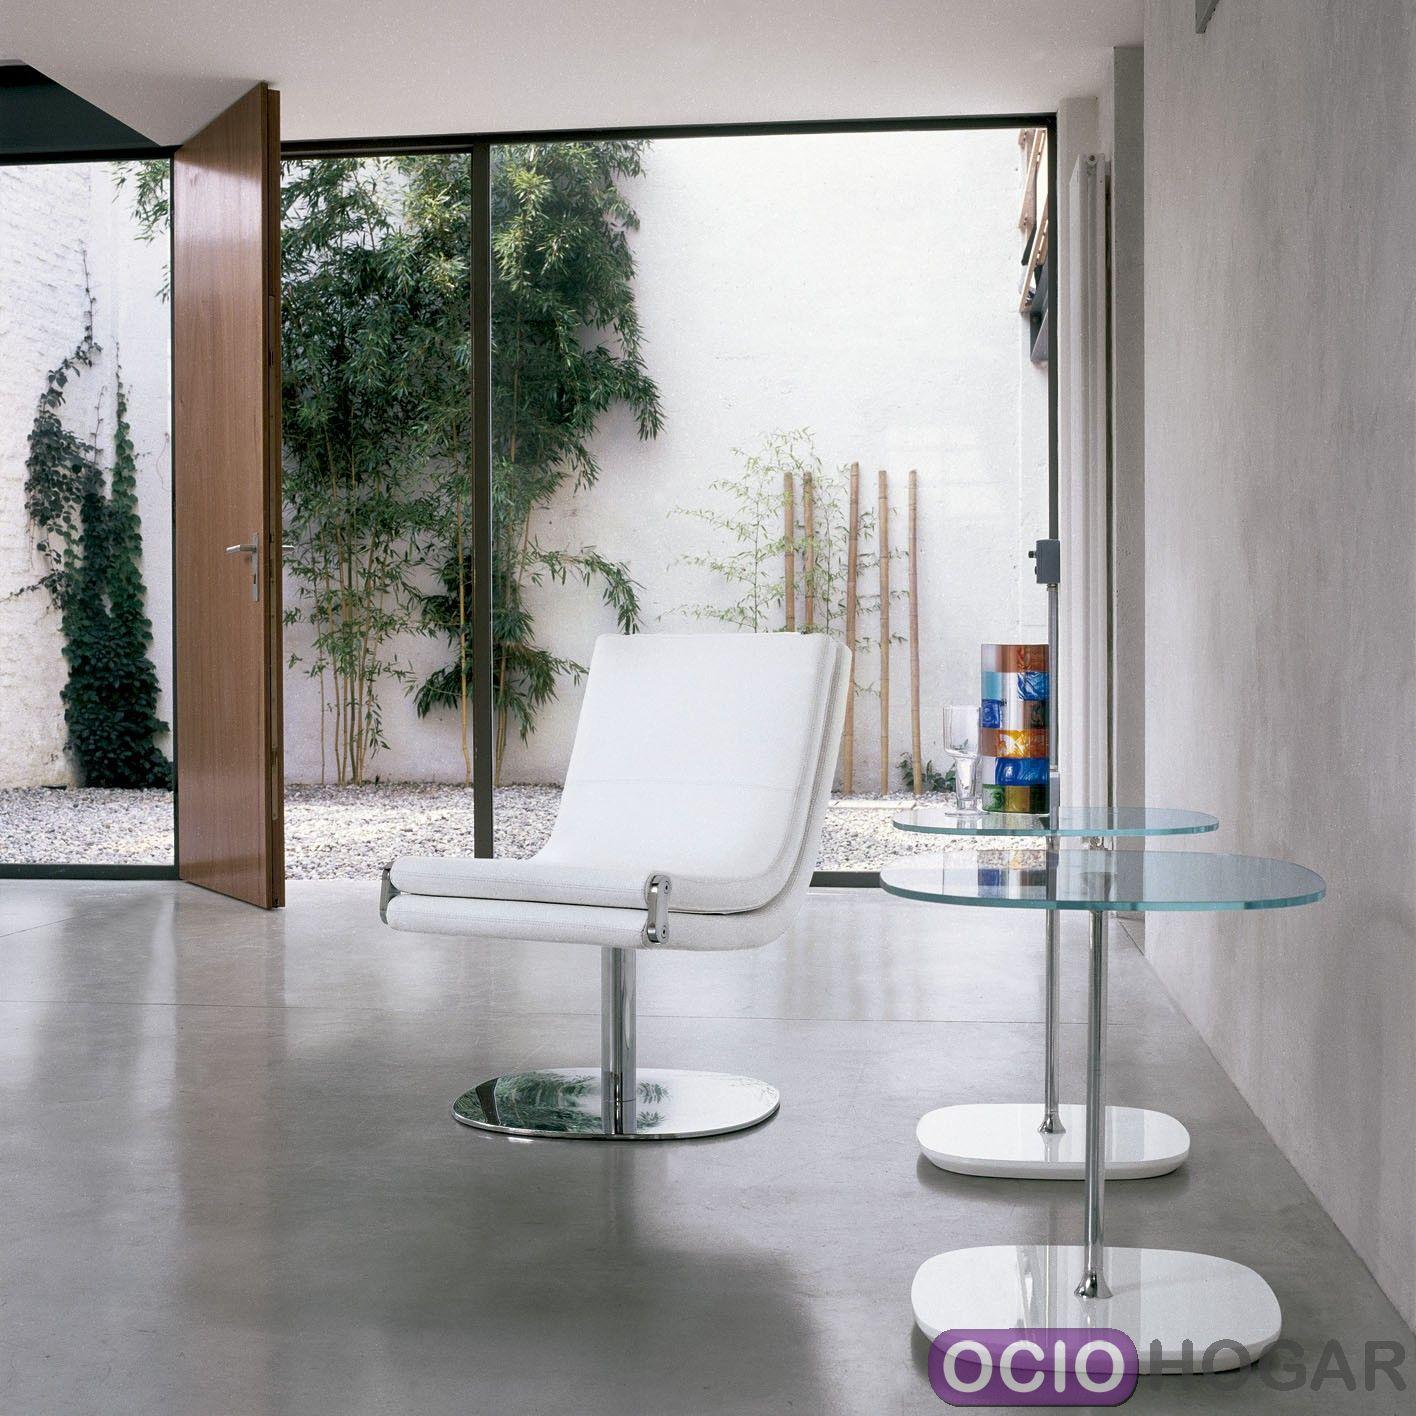 Comprar butaca chaise longue dragonfly de bonaldo piel natural o ecopiel online - Butaca chaise longue ...